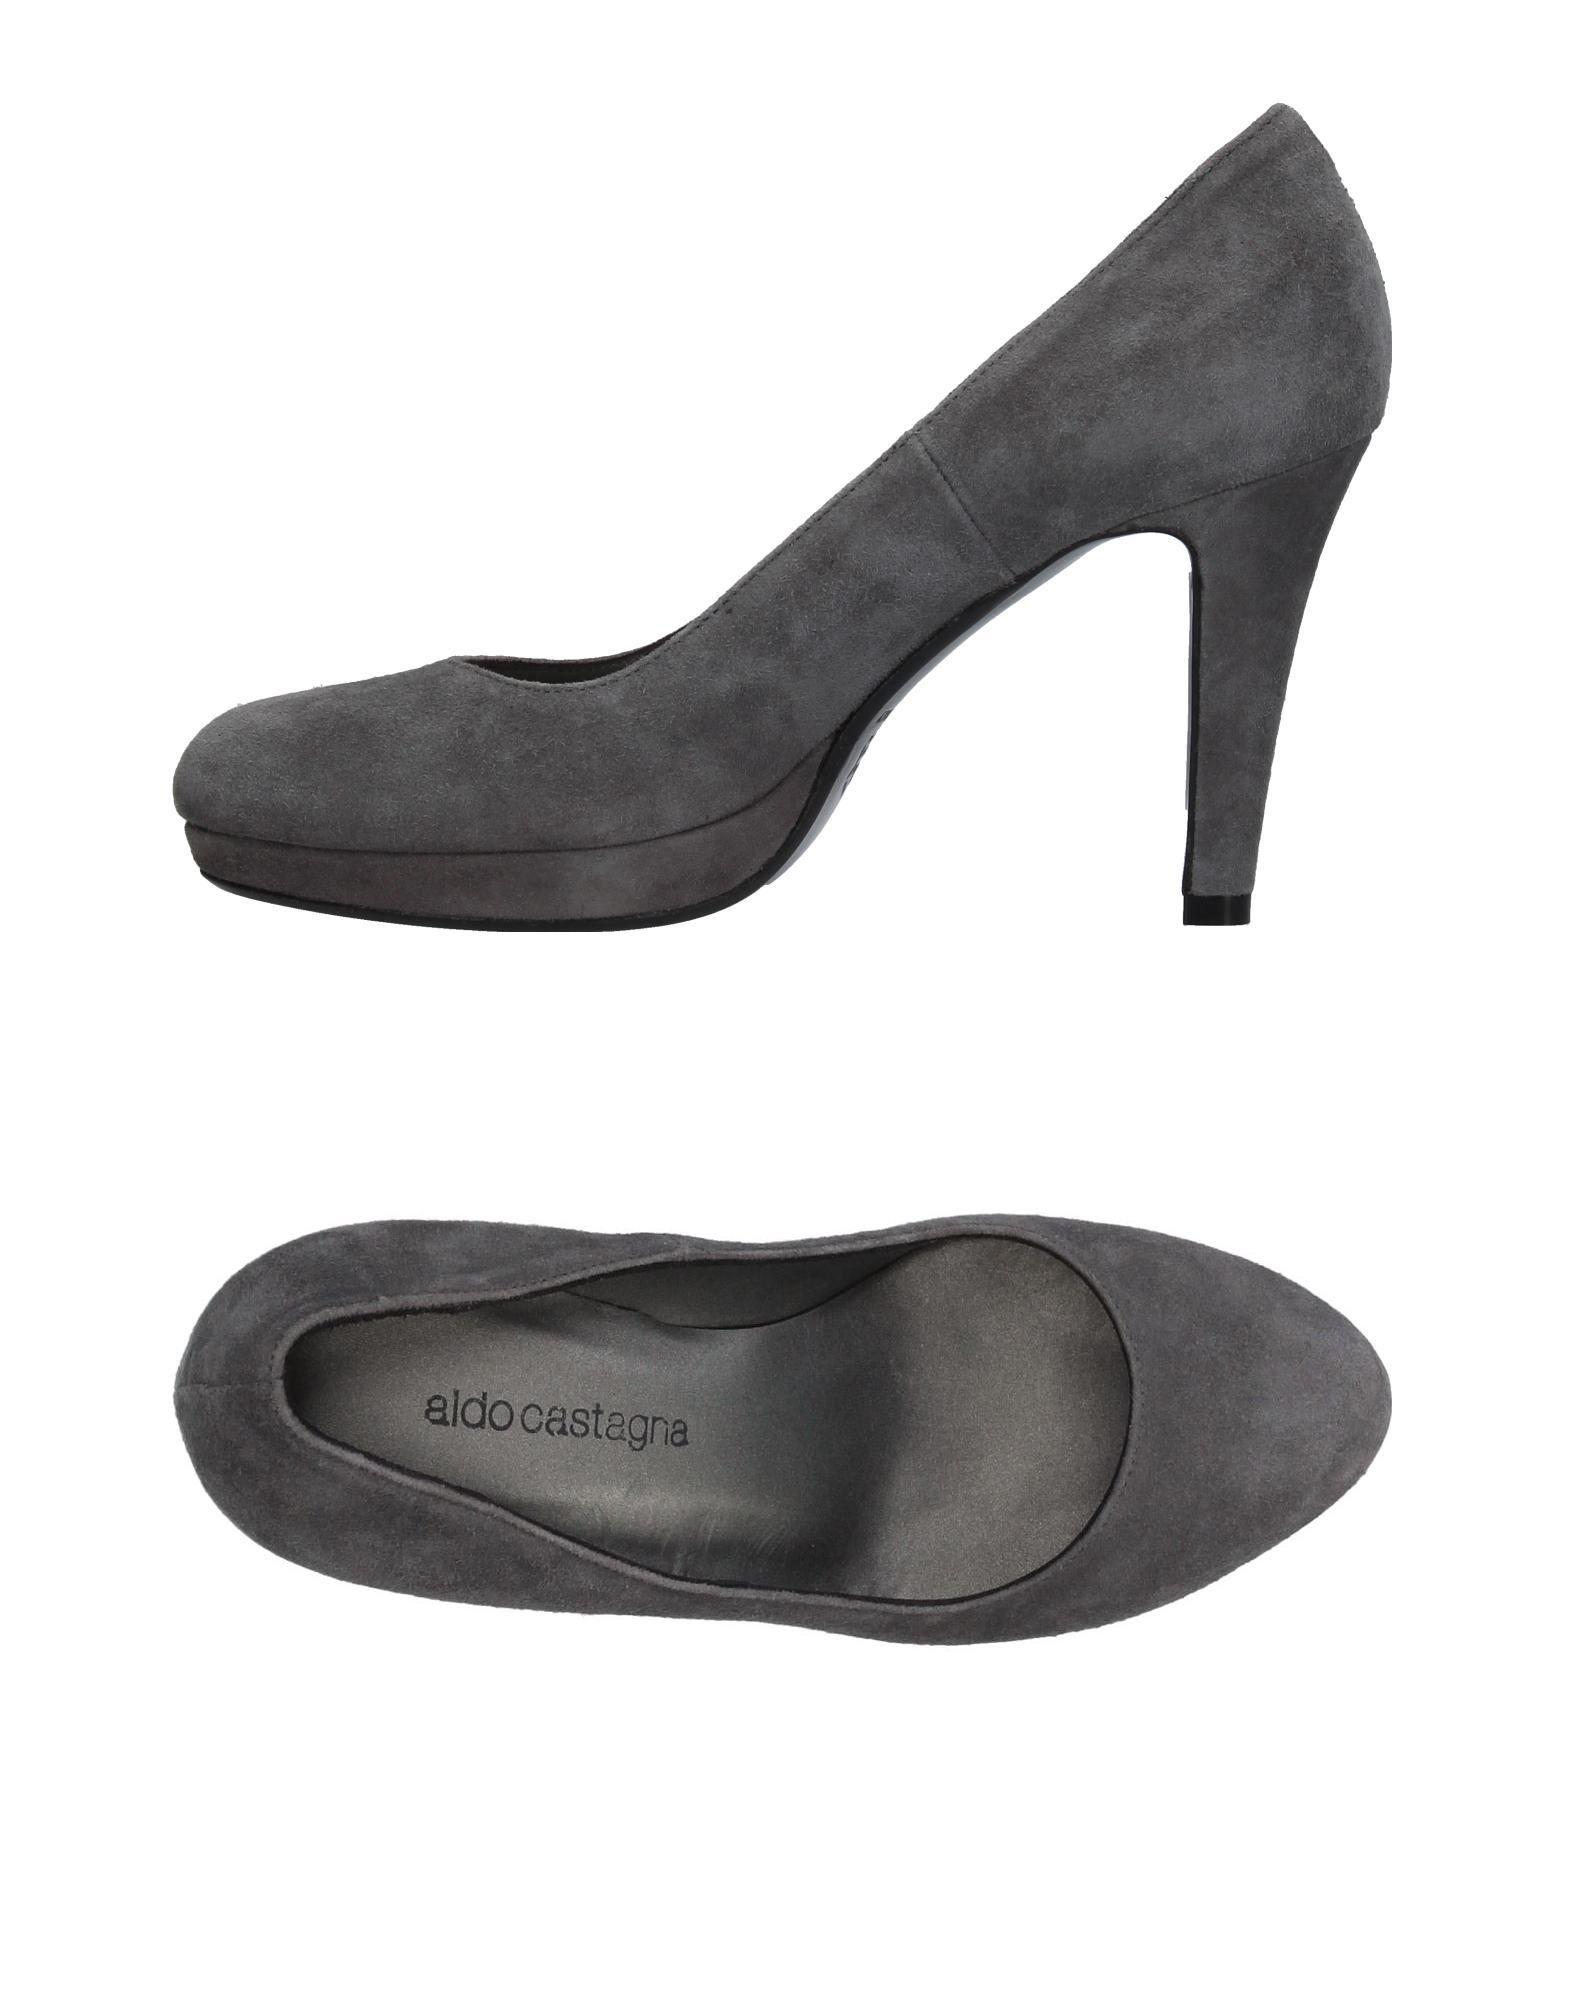 Aldo Castagna  Pumps Damen  Castagna 11374365KD Gute Qualität beliebte Schuhe 4f91ae